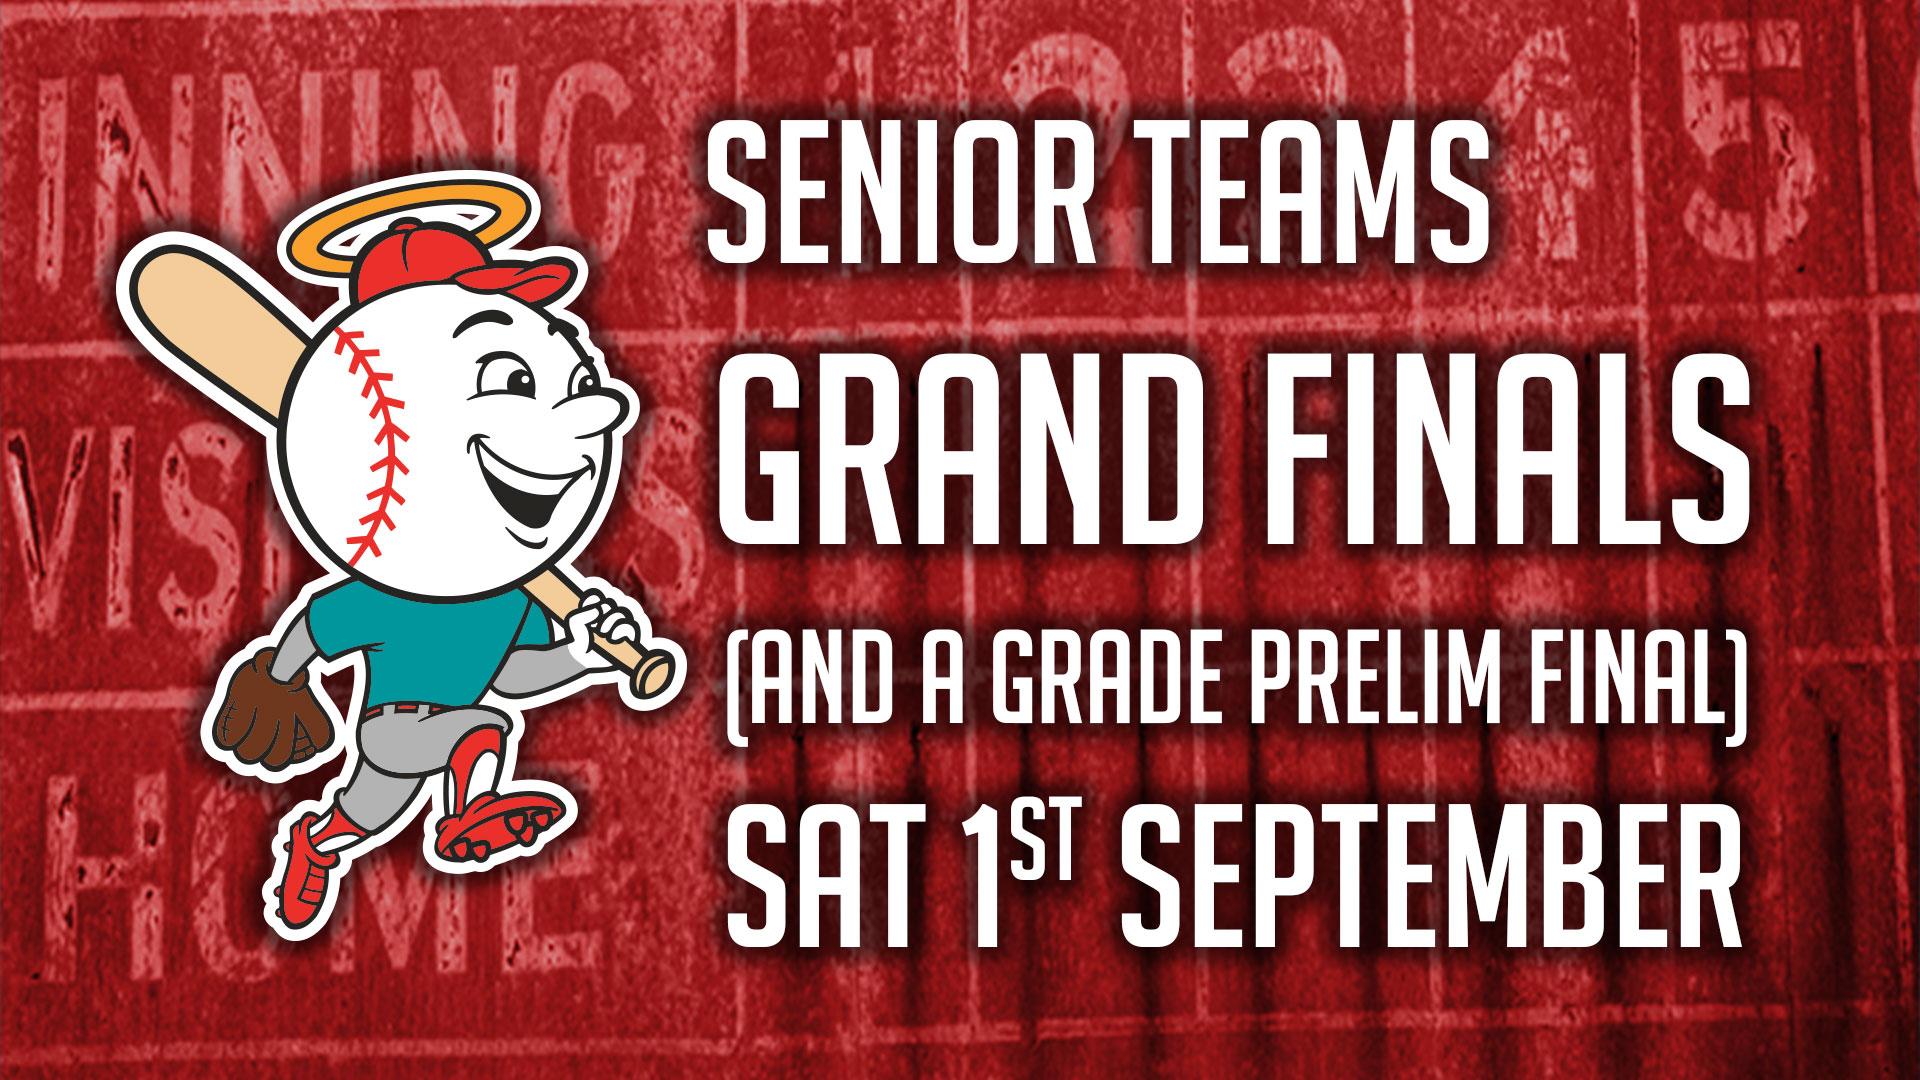 Senior Teams: 1st September